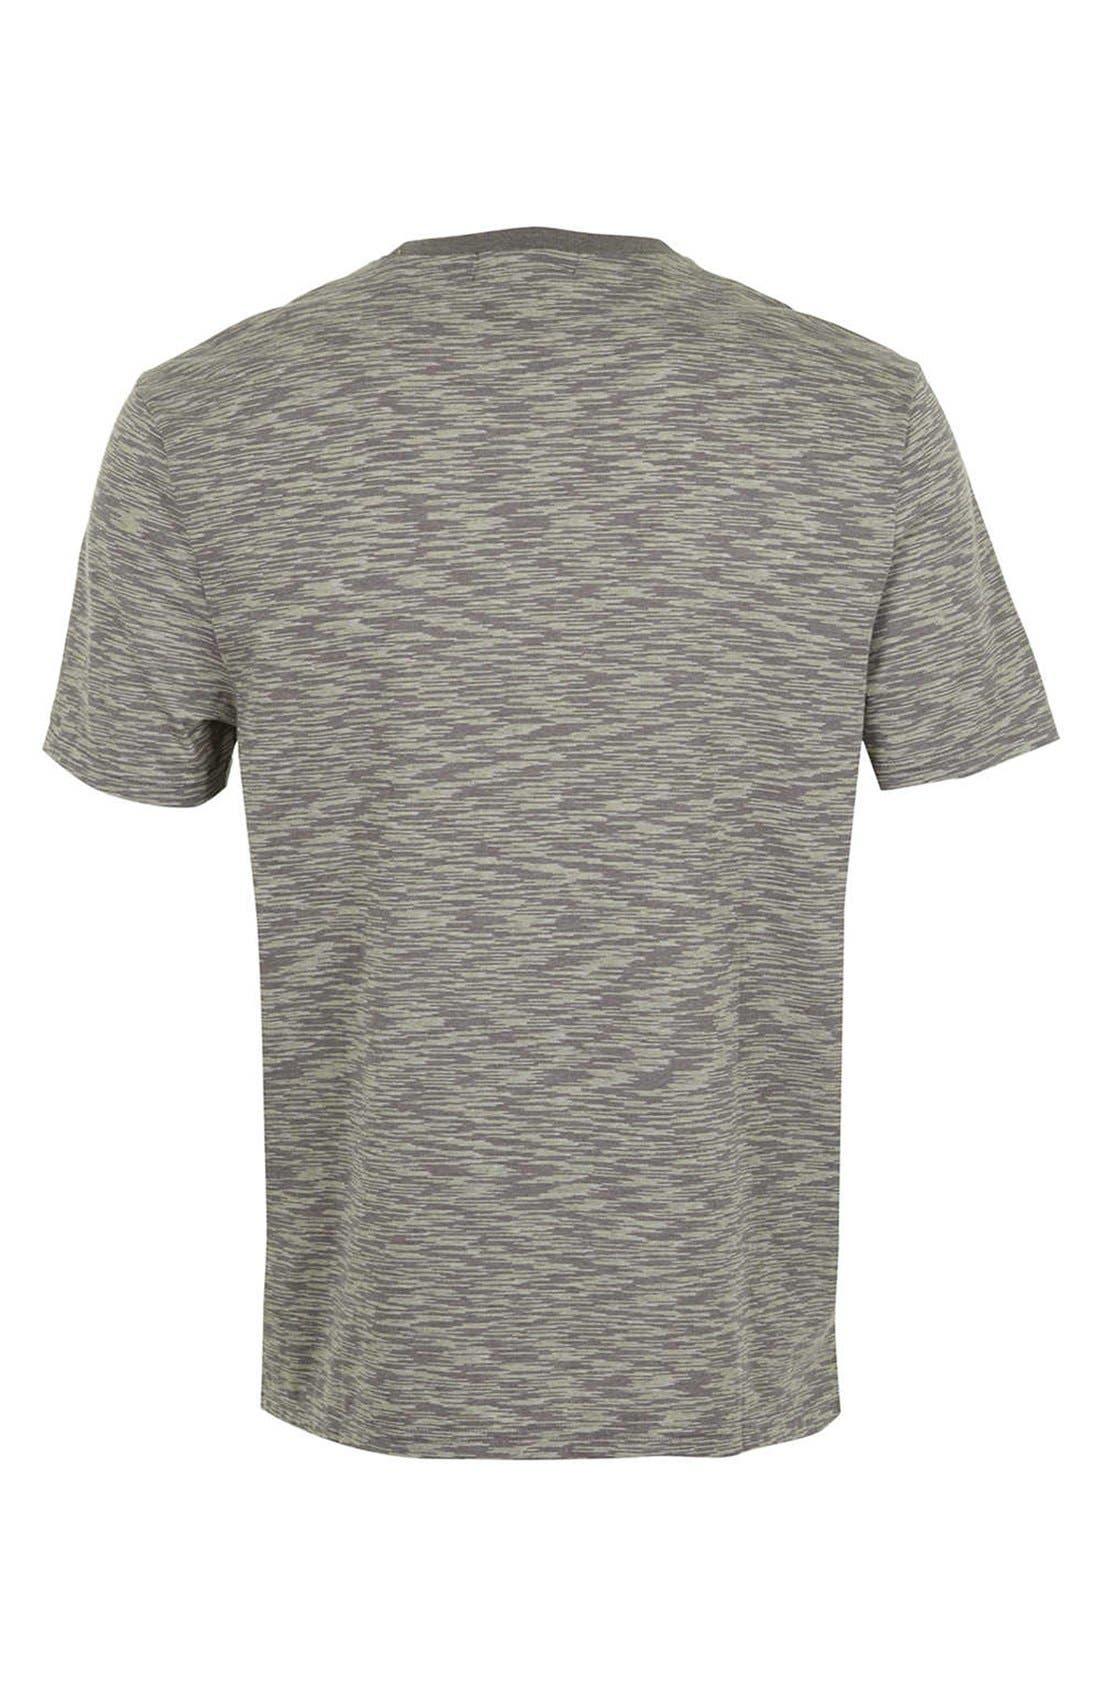 Alternate Image 2  - Topman Space Dye T-Shirt